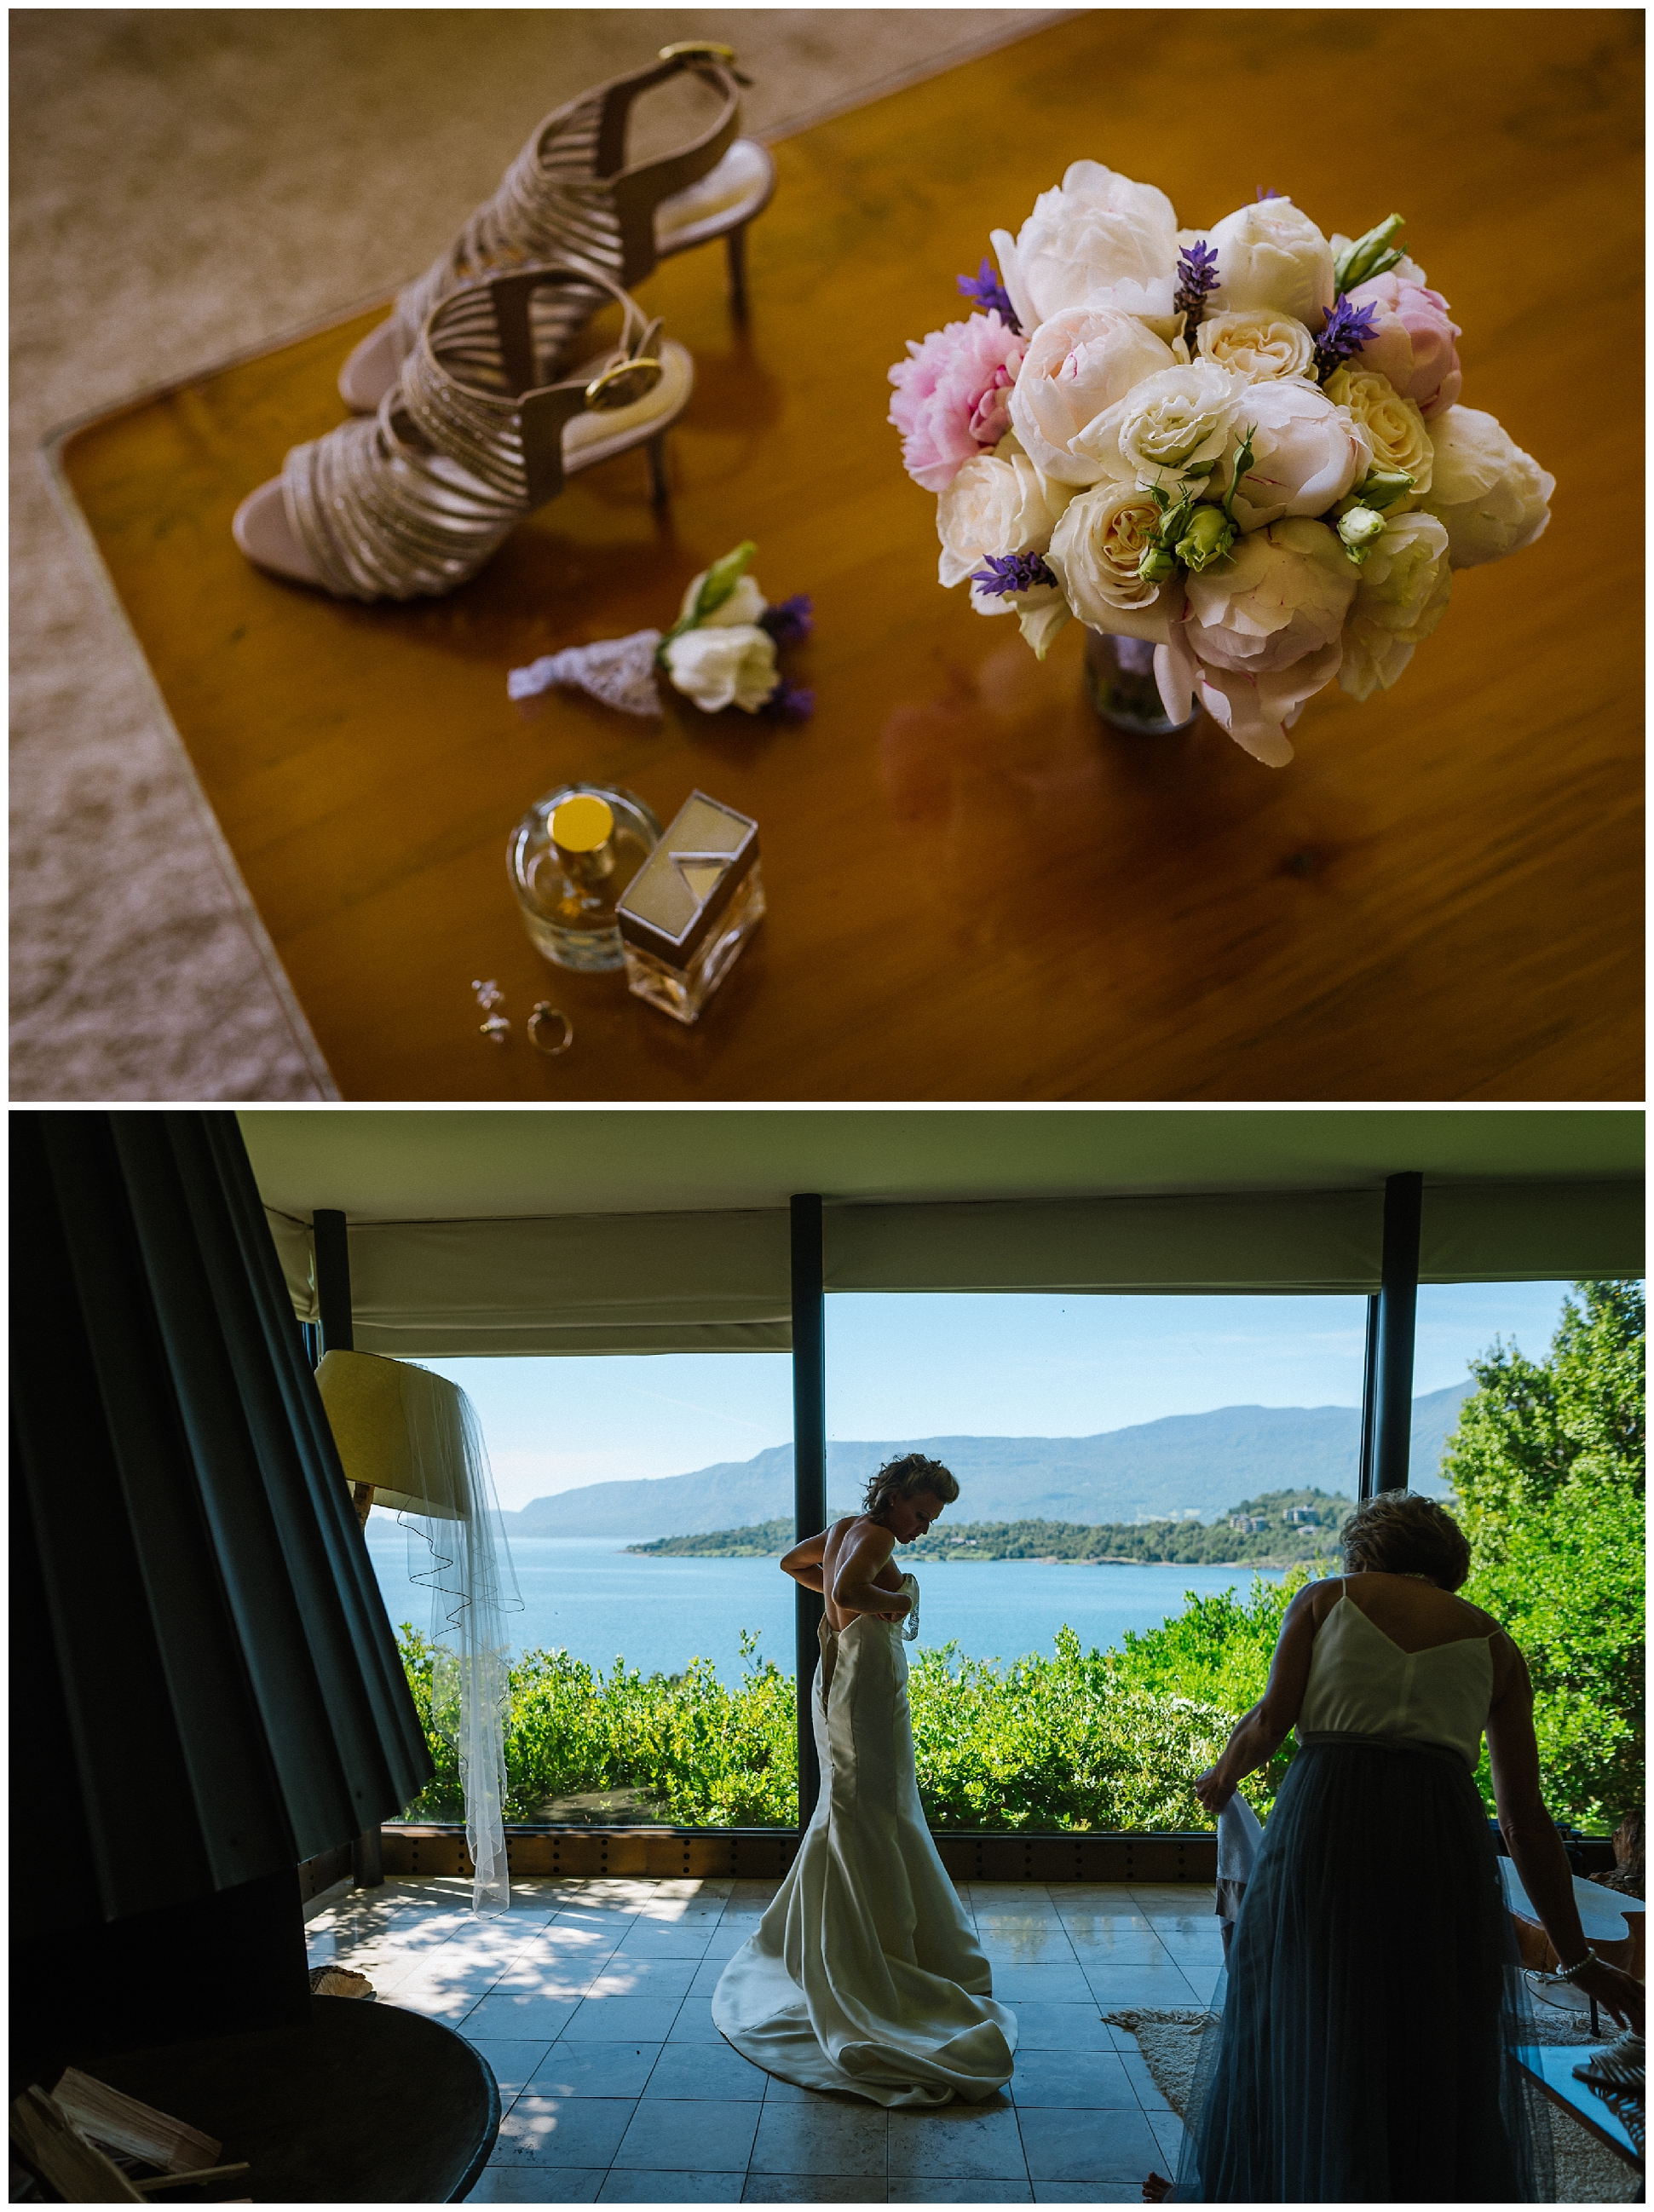 Cheilean-destination-adventure-wedding-florida-patagonia-pucon-santa-cruz-vsco_0080.jpg